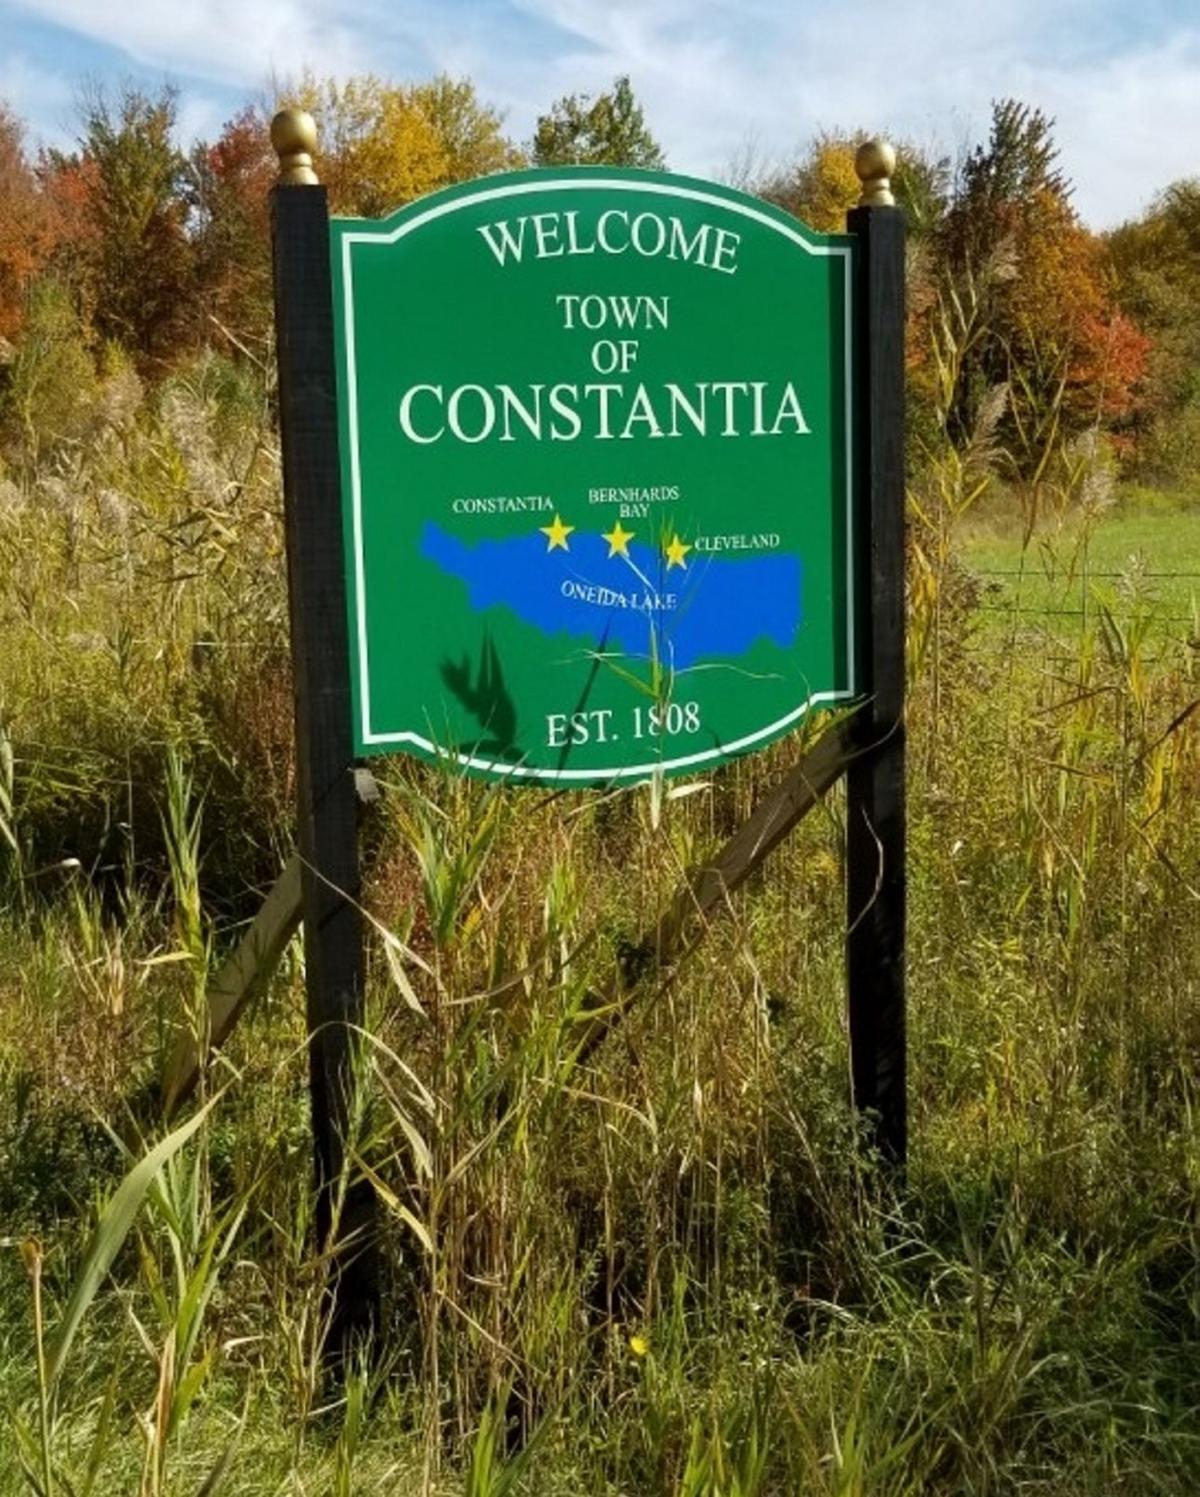 Signs of Constantia revitalization